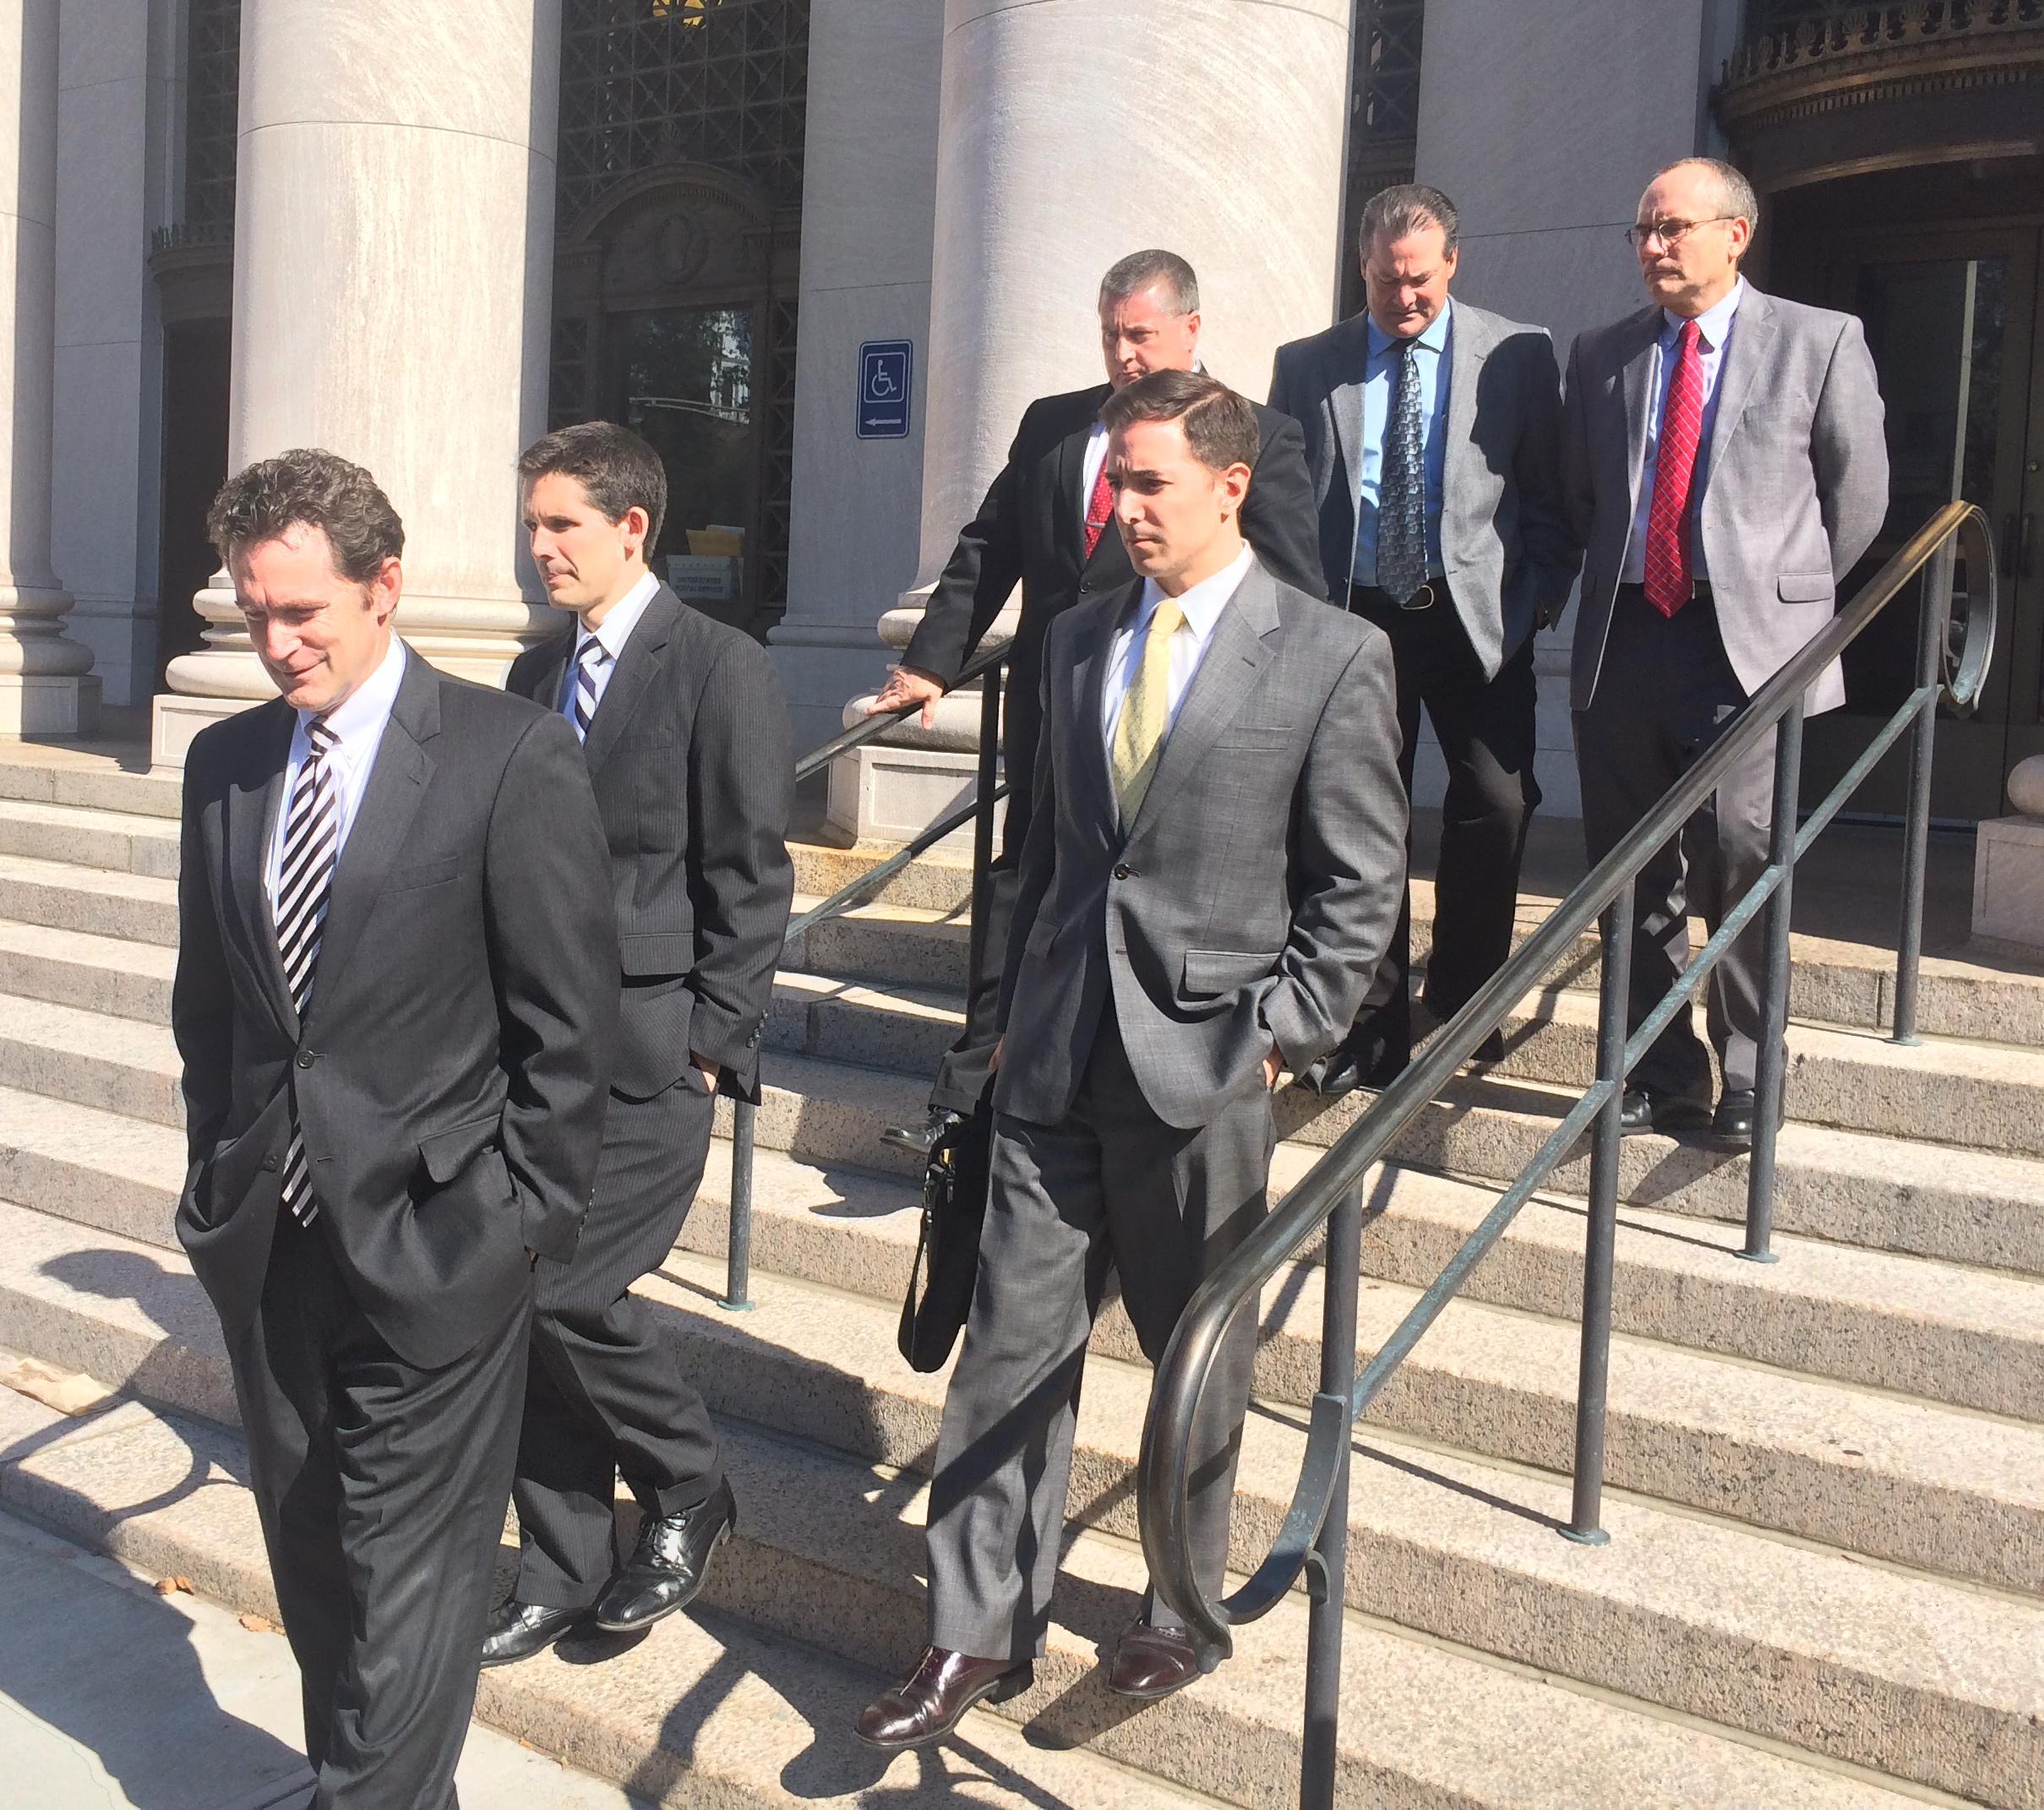 Michael J. Gustafon, trailed by Liam Brennan, Christopher Mattei and investigators.